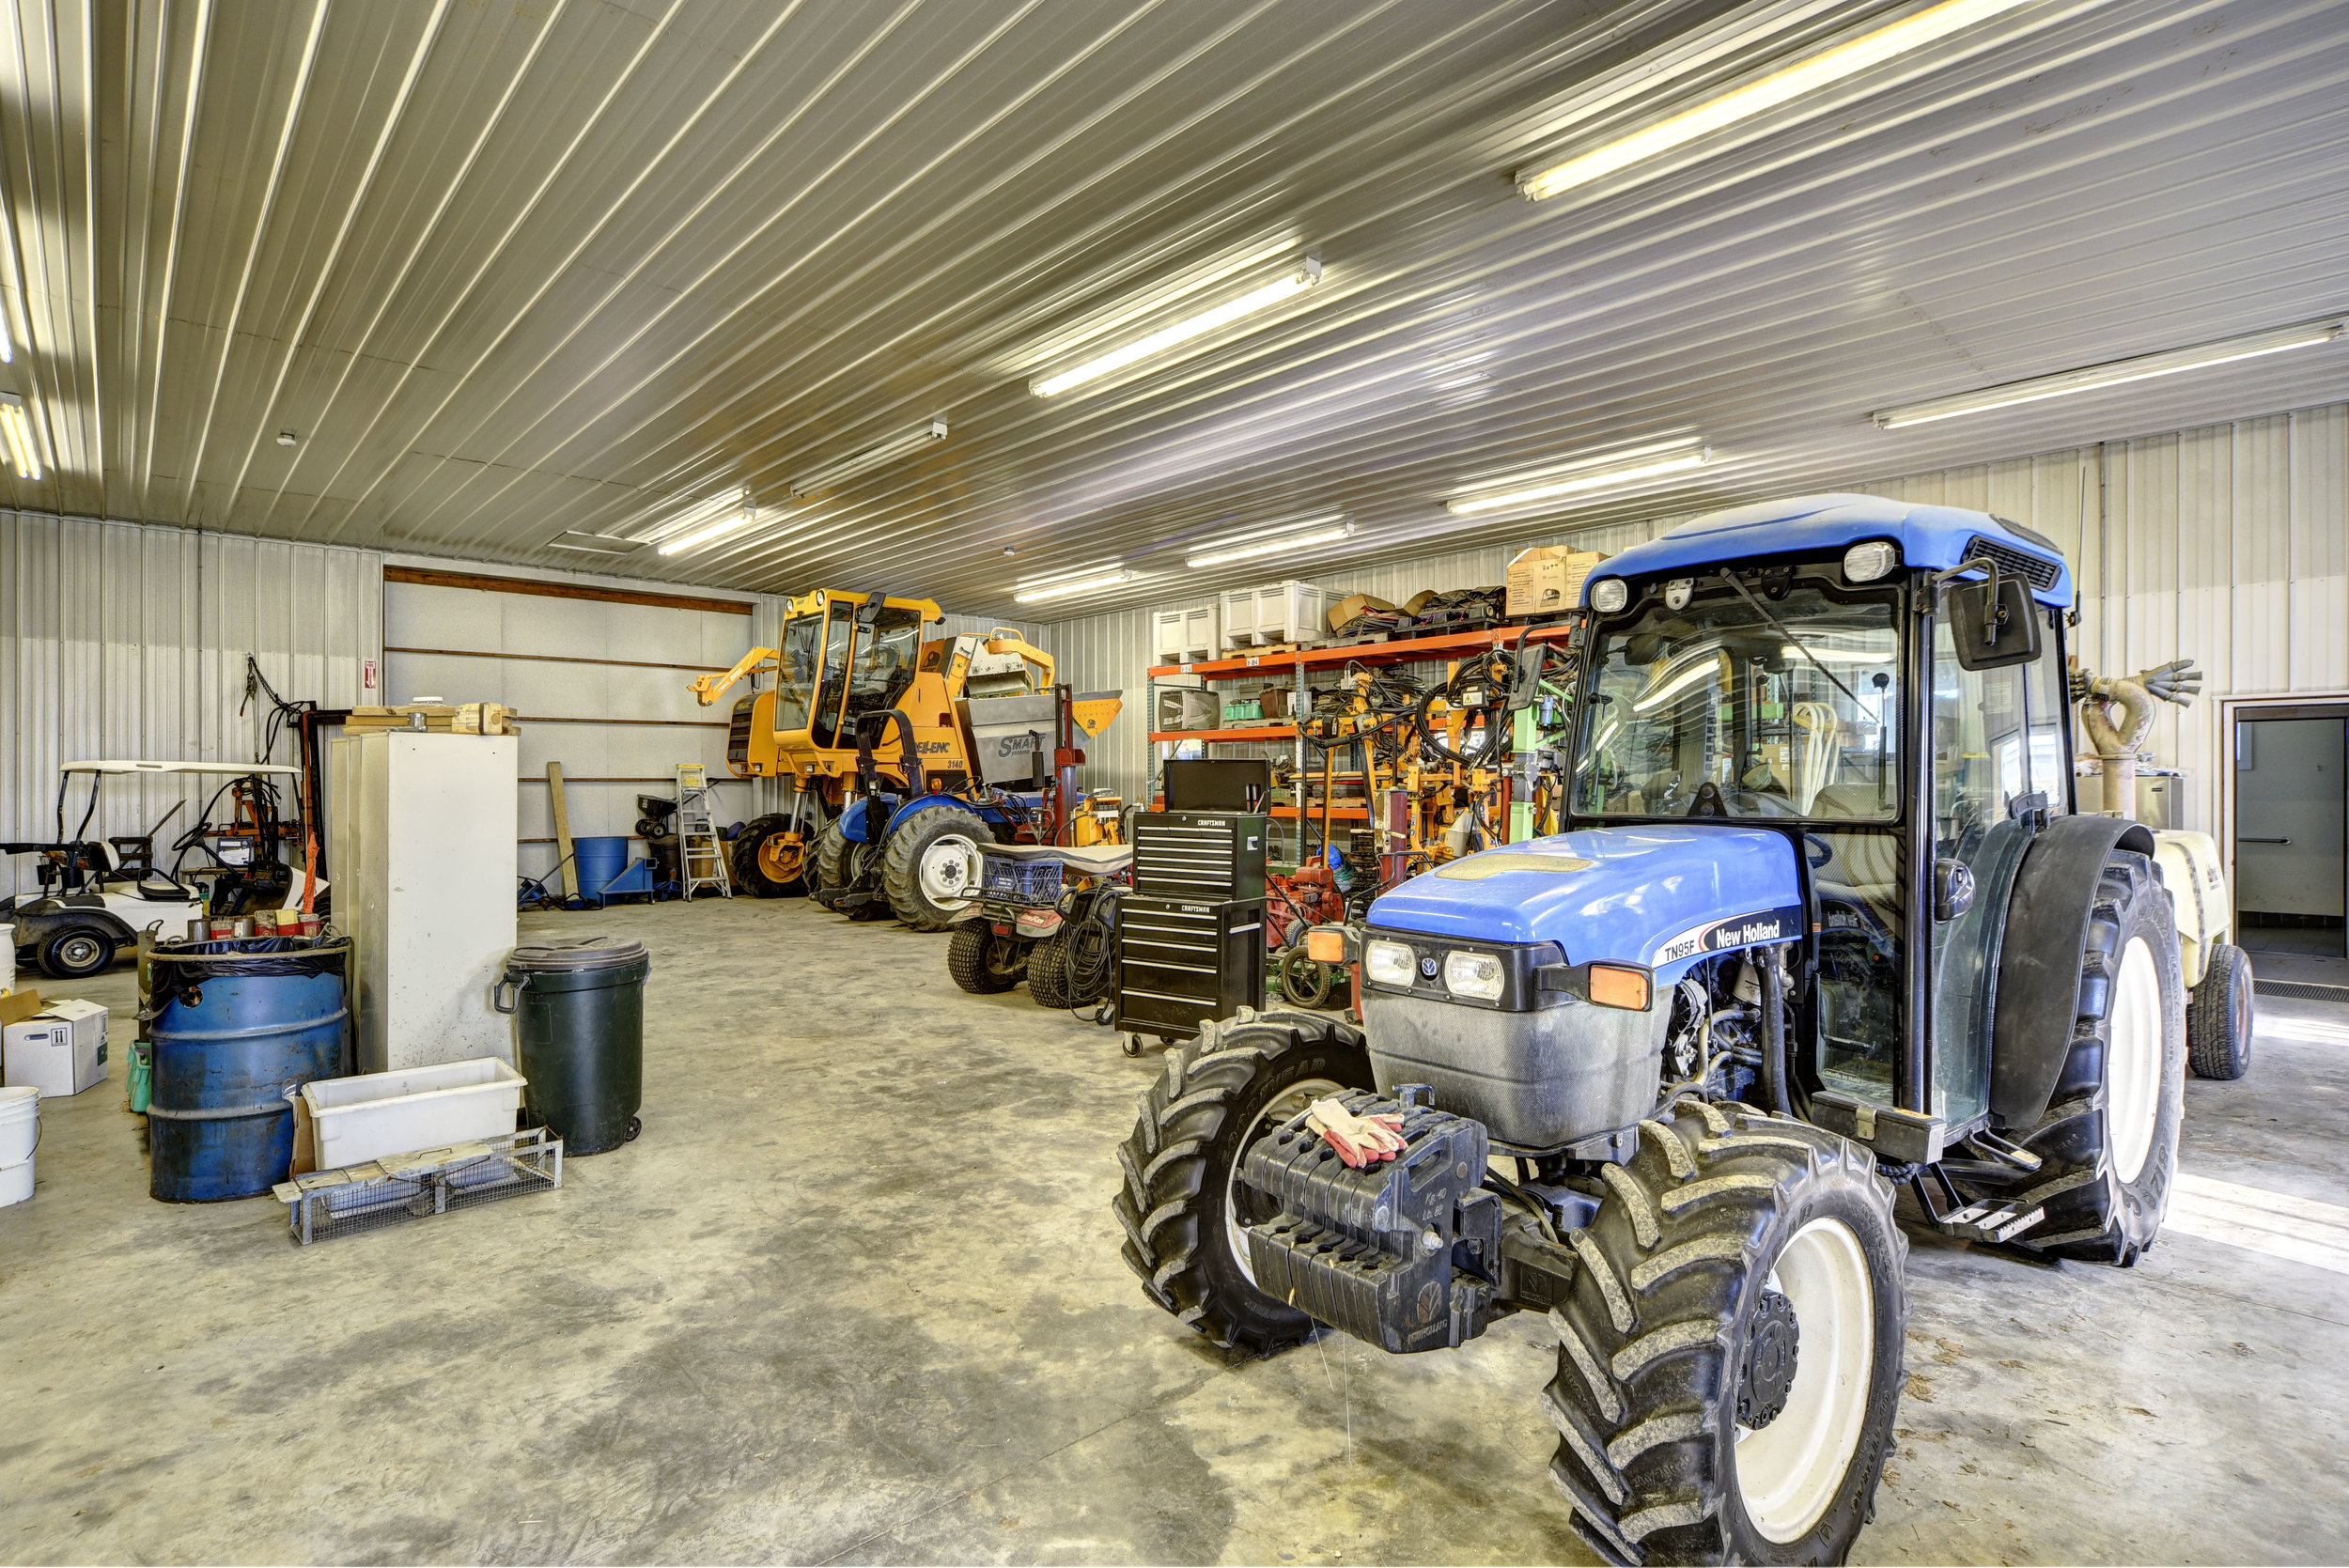 Equipment Storage -